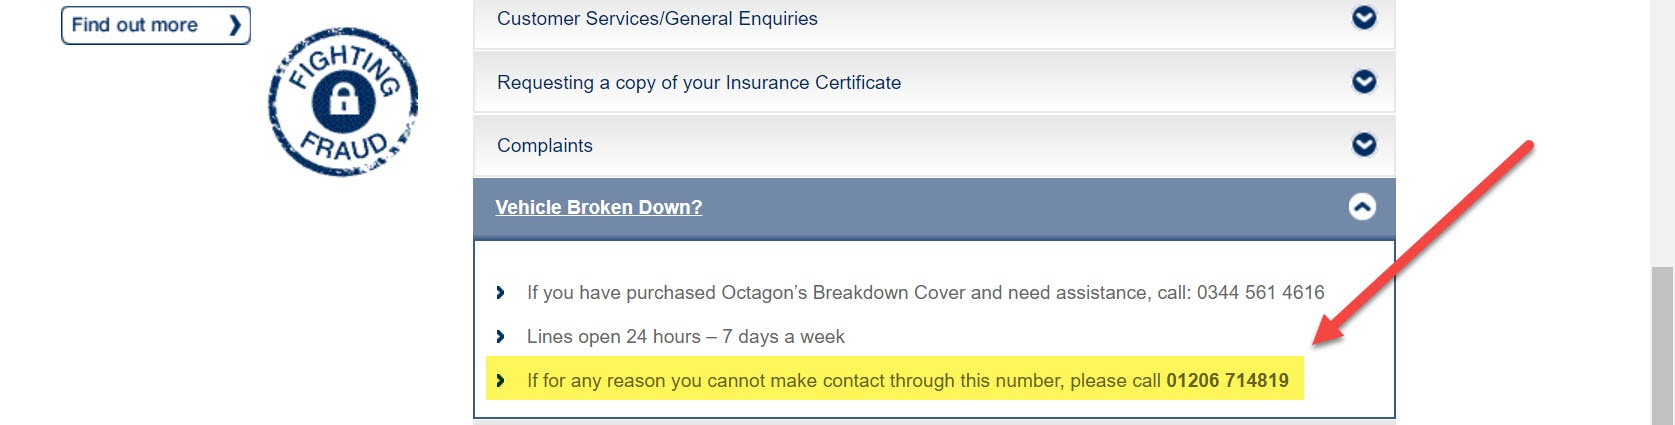 Octagon Vehicle Breakdown number